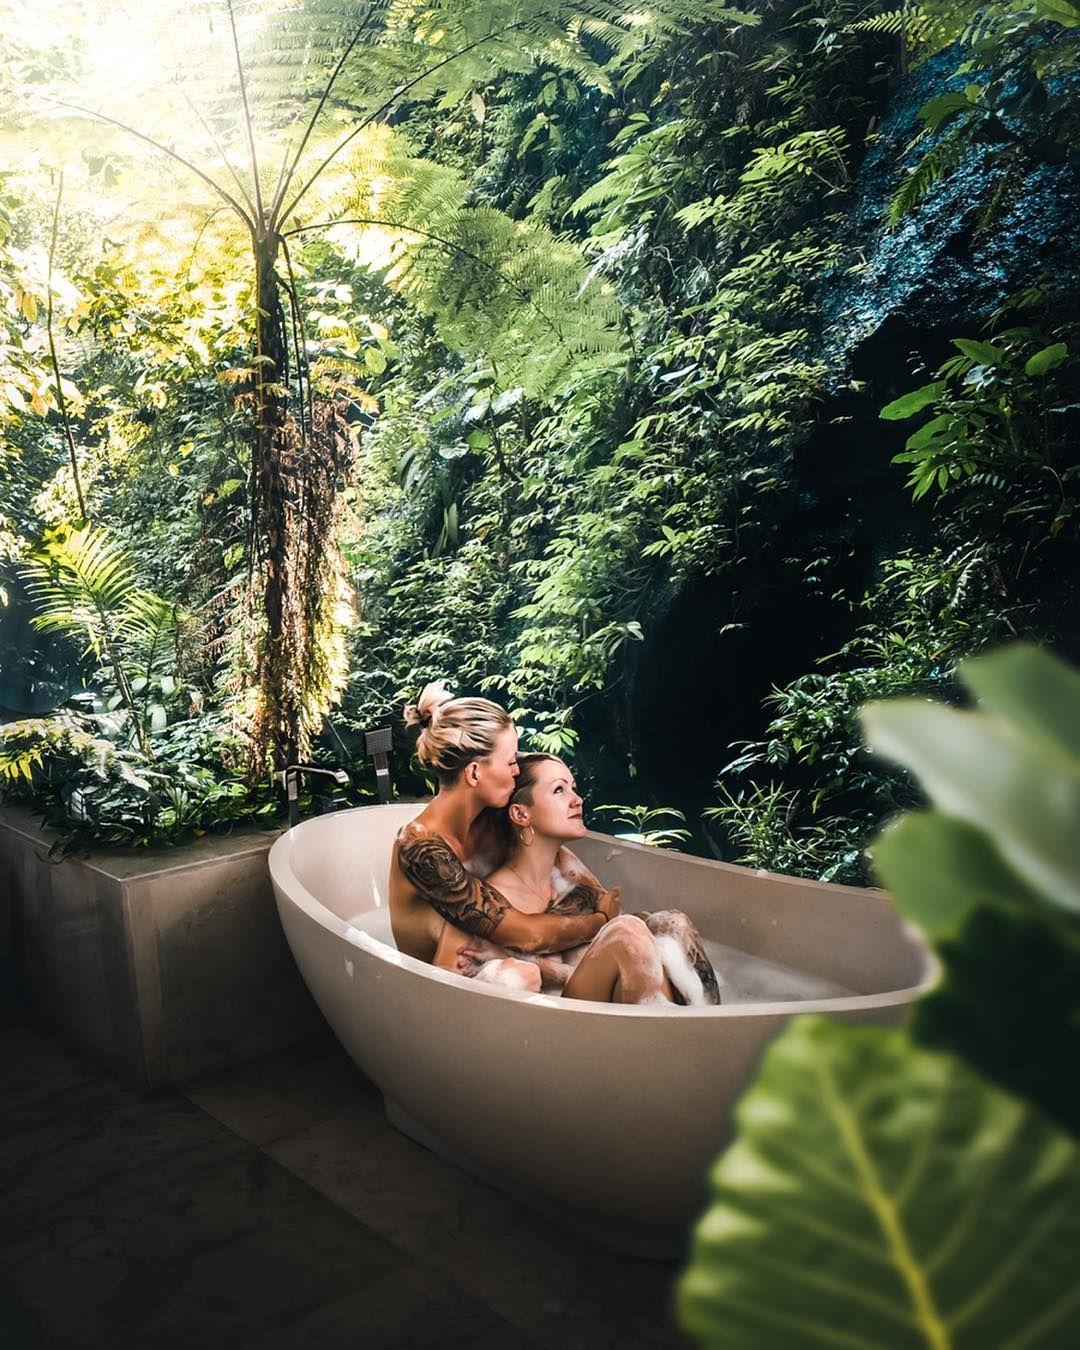 Bali Jungle Bath Lesbian Couple With Images Cute Lesbian